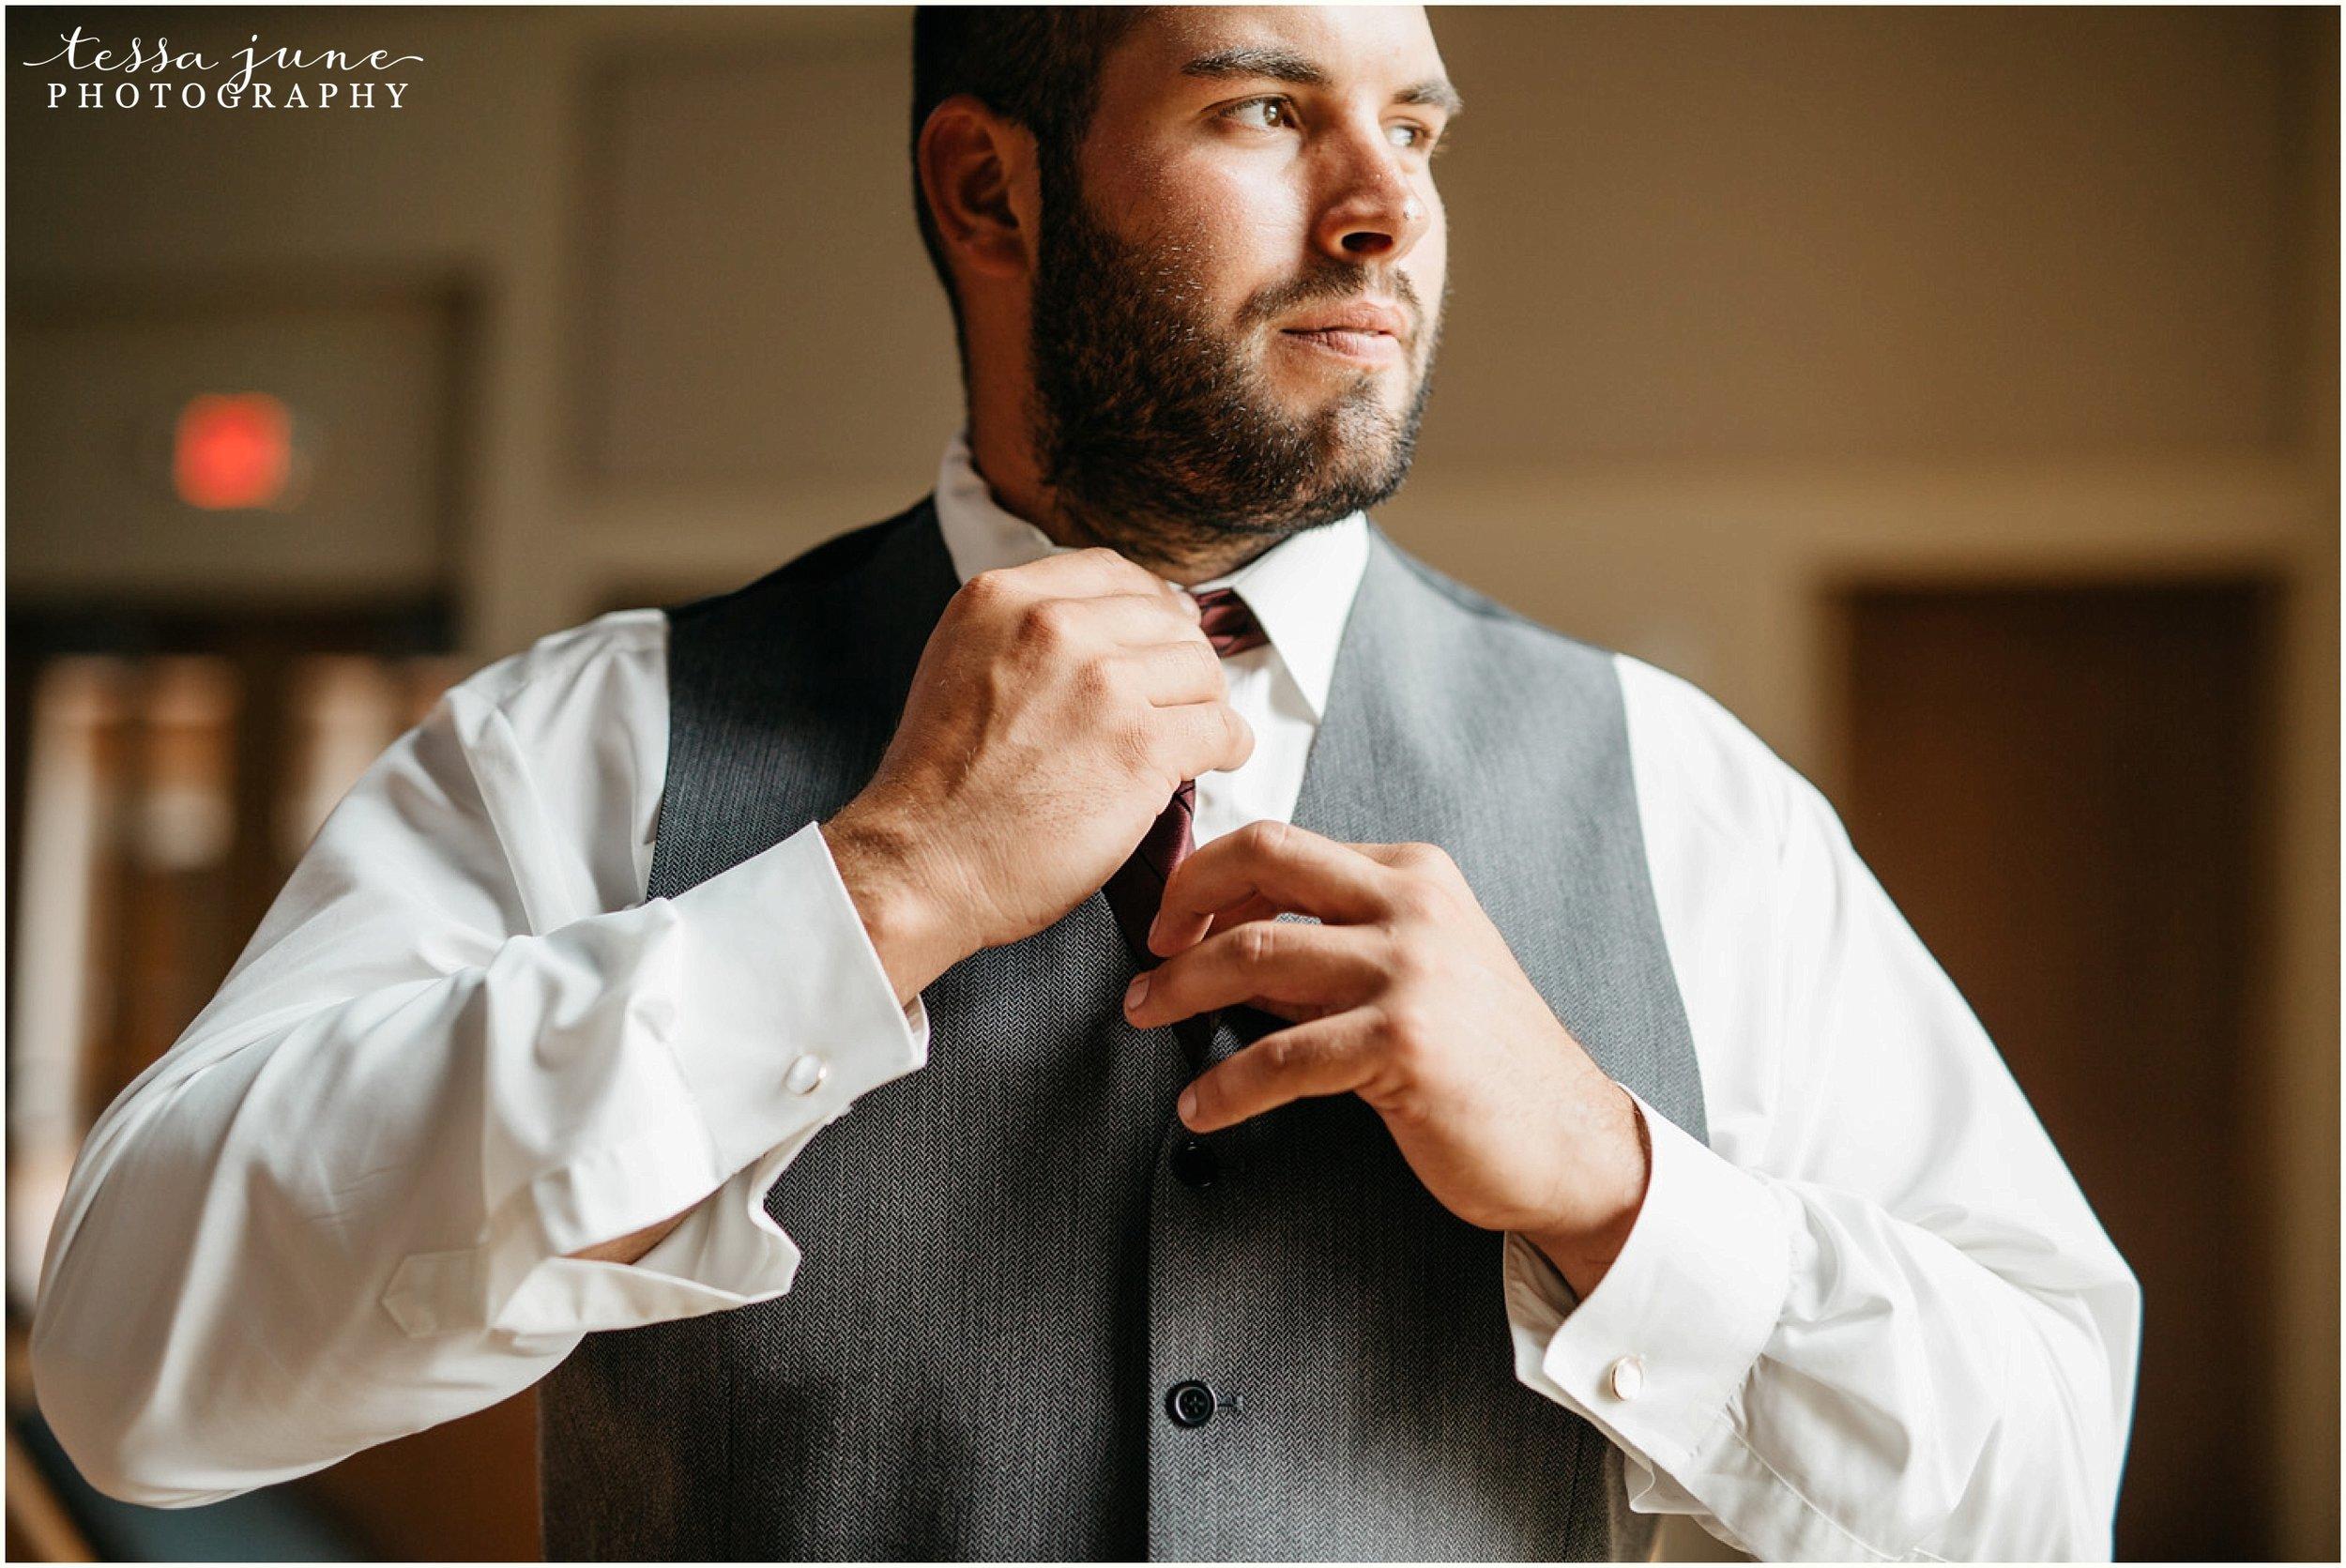 bohemian-minnesota-wedding-mismatched-bridesmaid-dresses-waterfall-st-cloud-tessa-june-photography-10.jpg